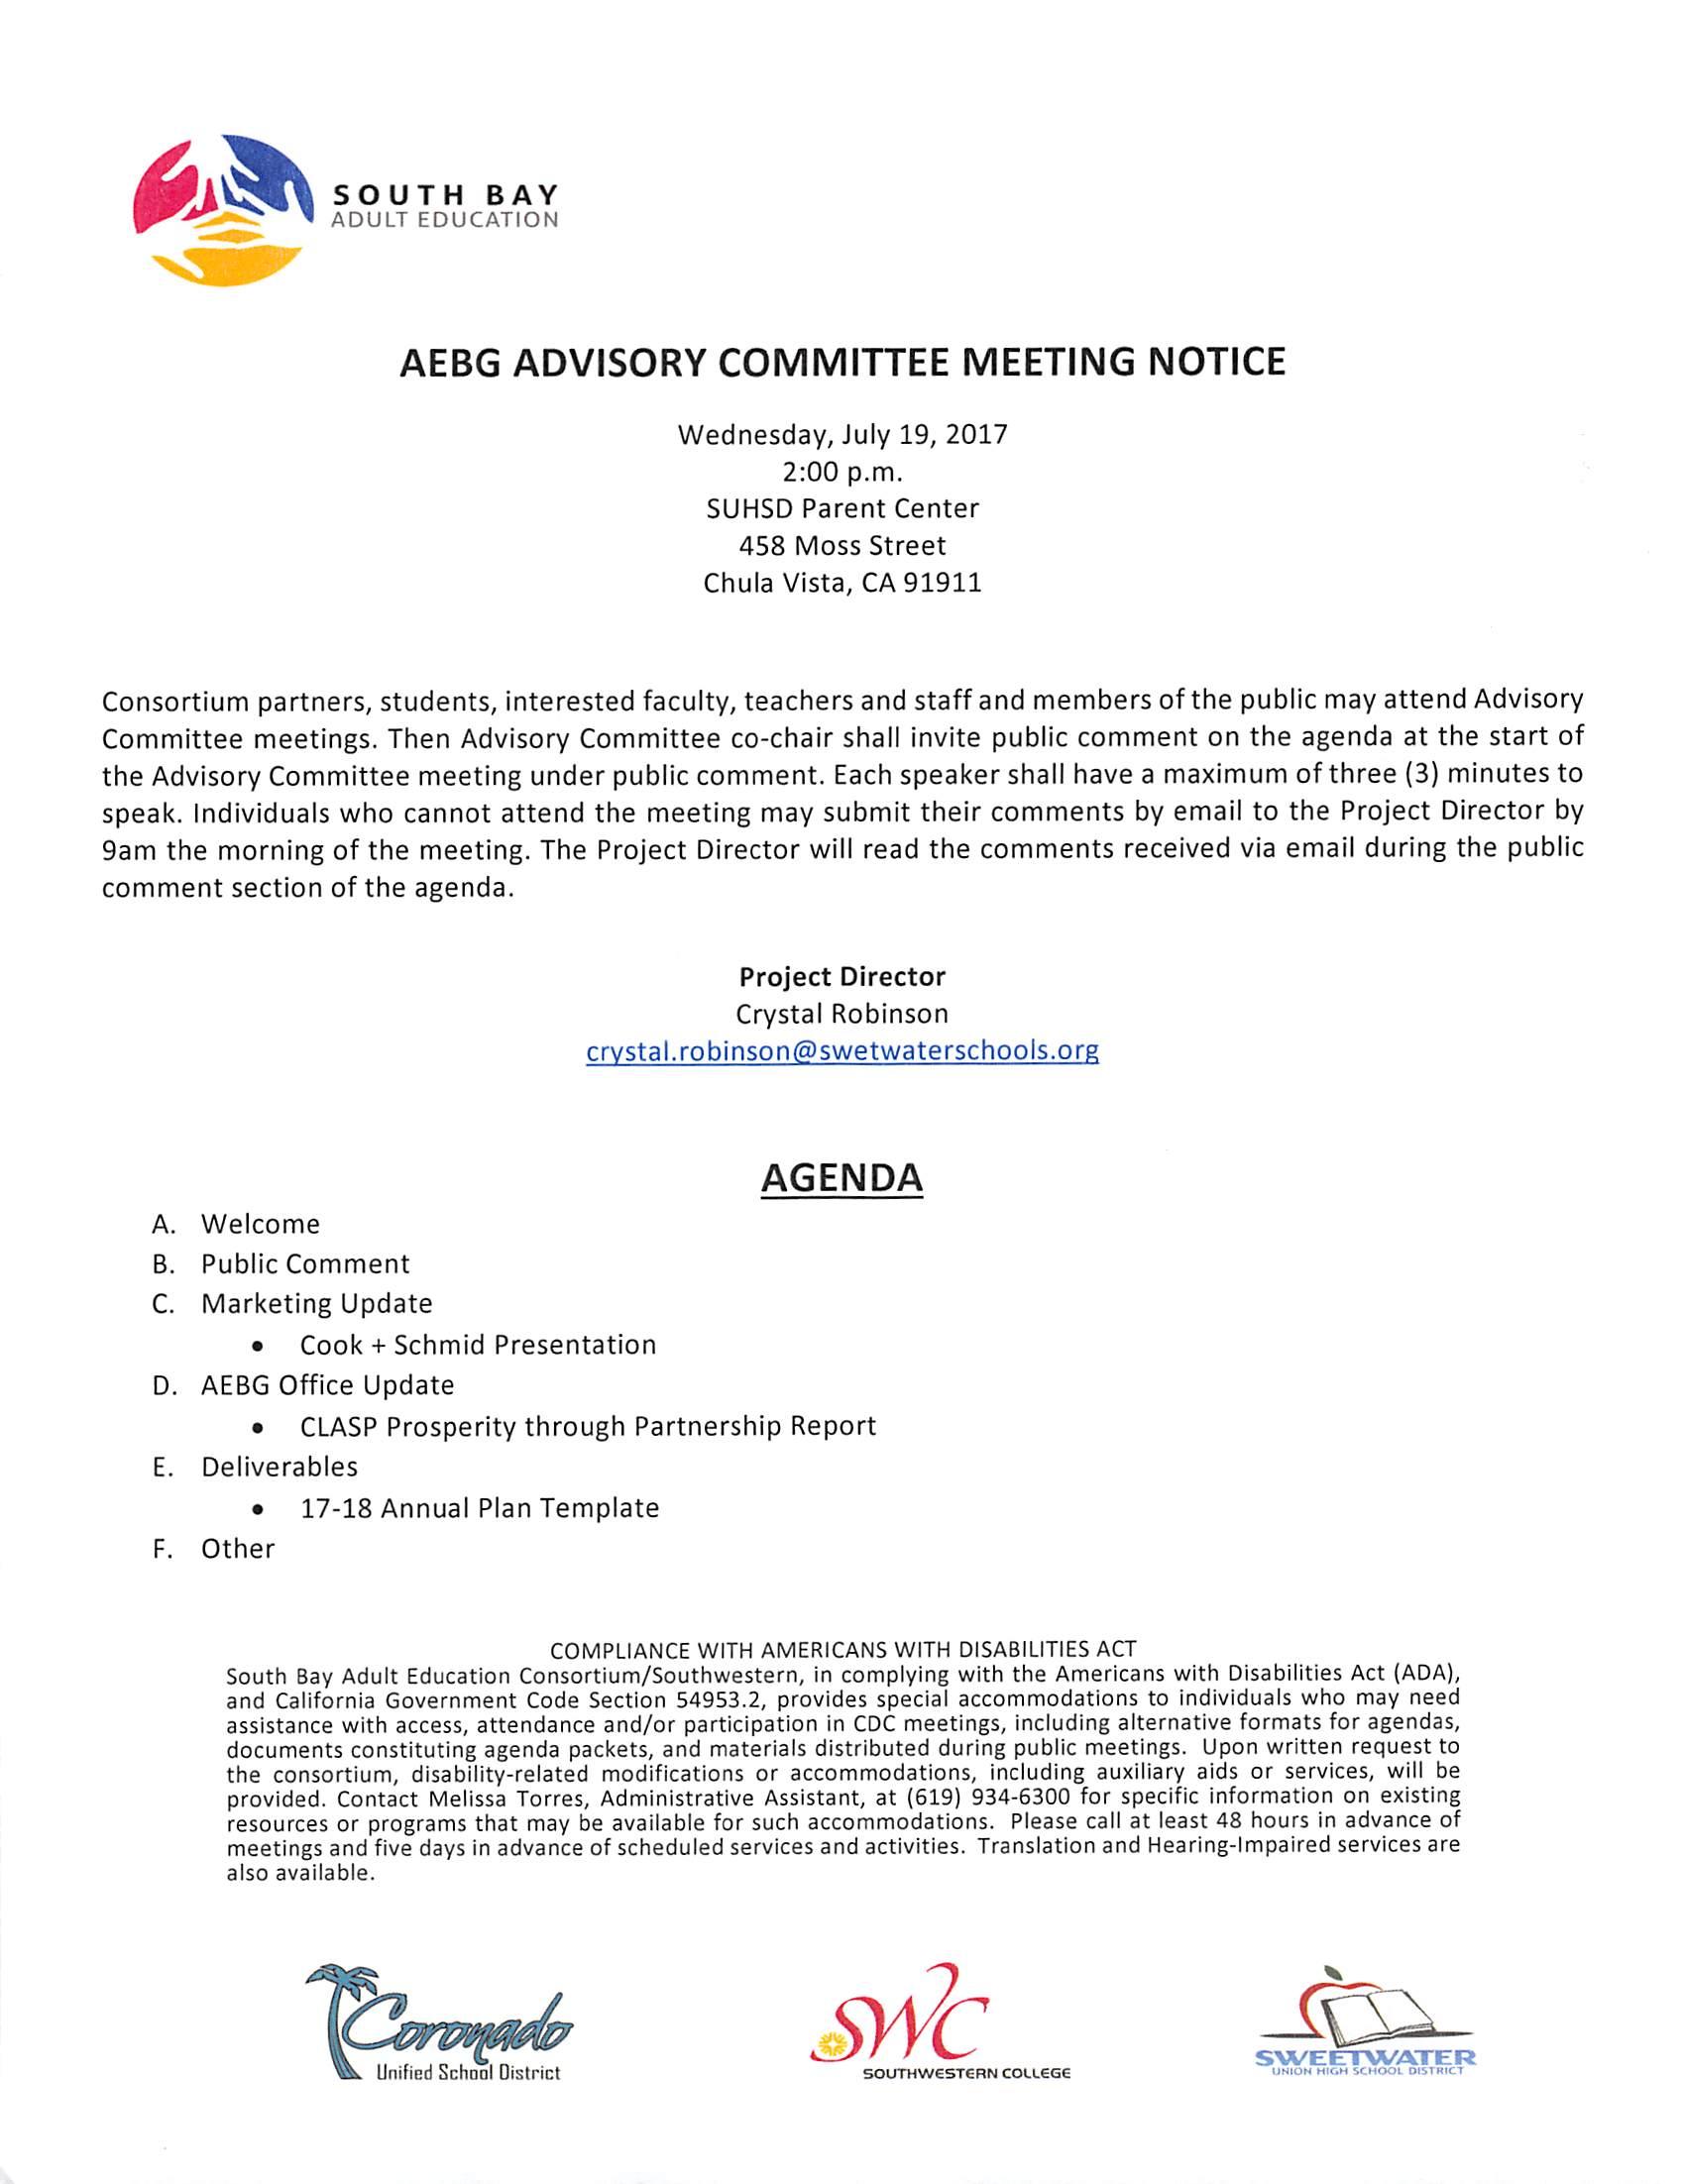 Advisory Committee Meeting Notice